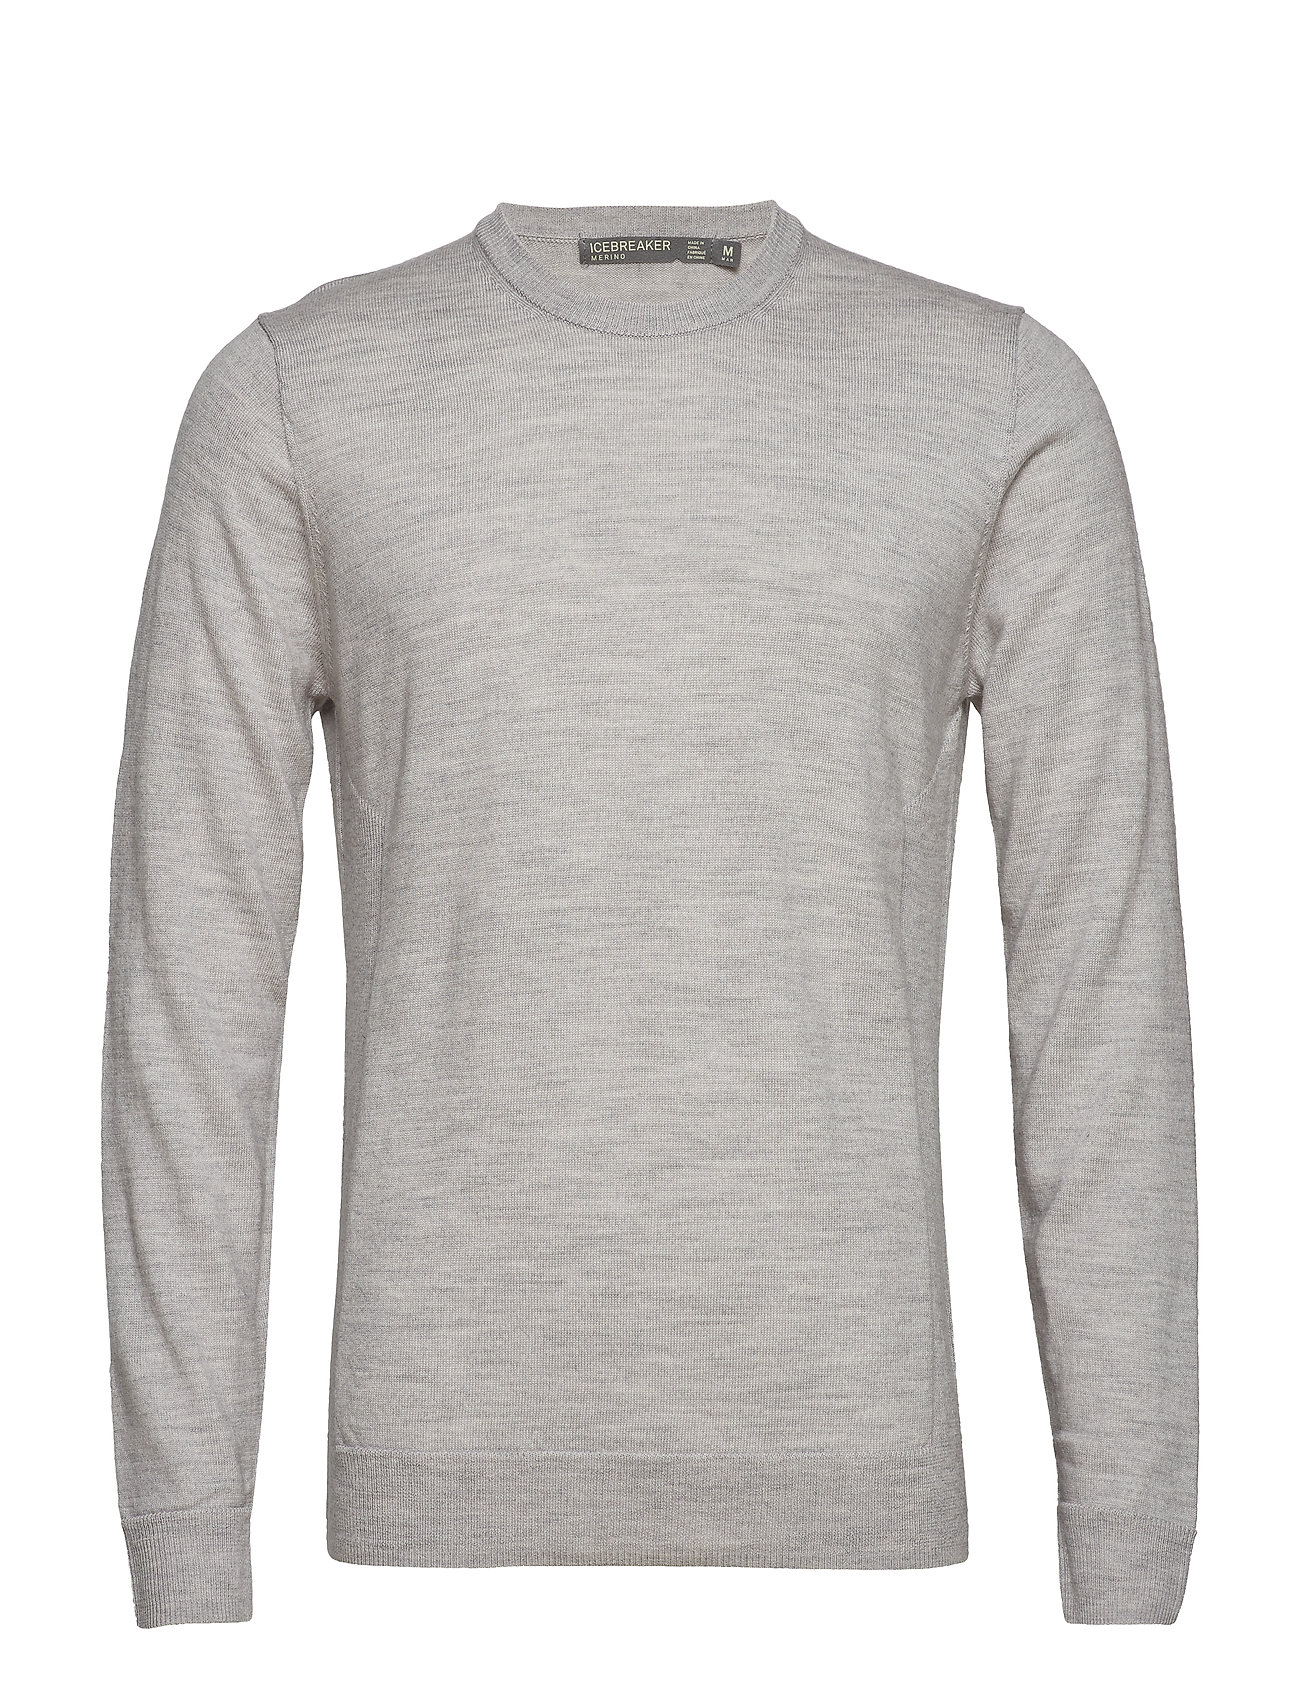 Icebreaker Mens Shearer Crewe Sweater - STEEL HTHR